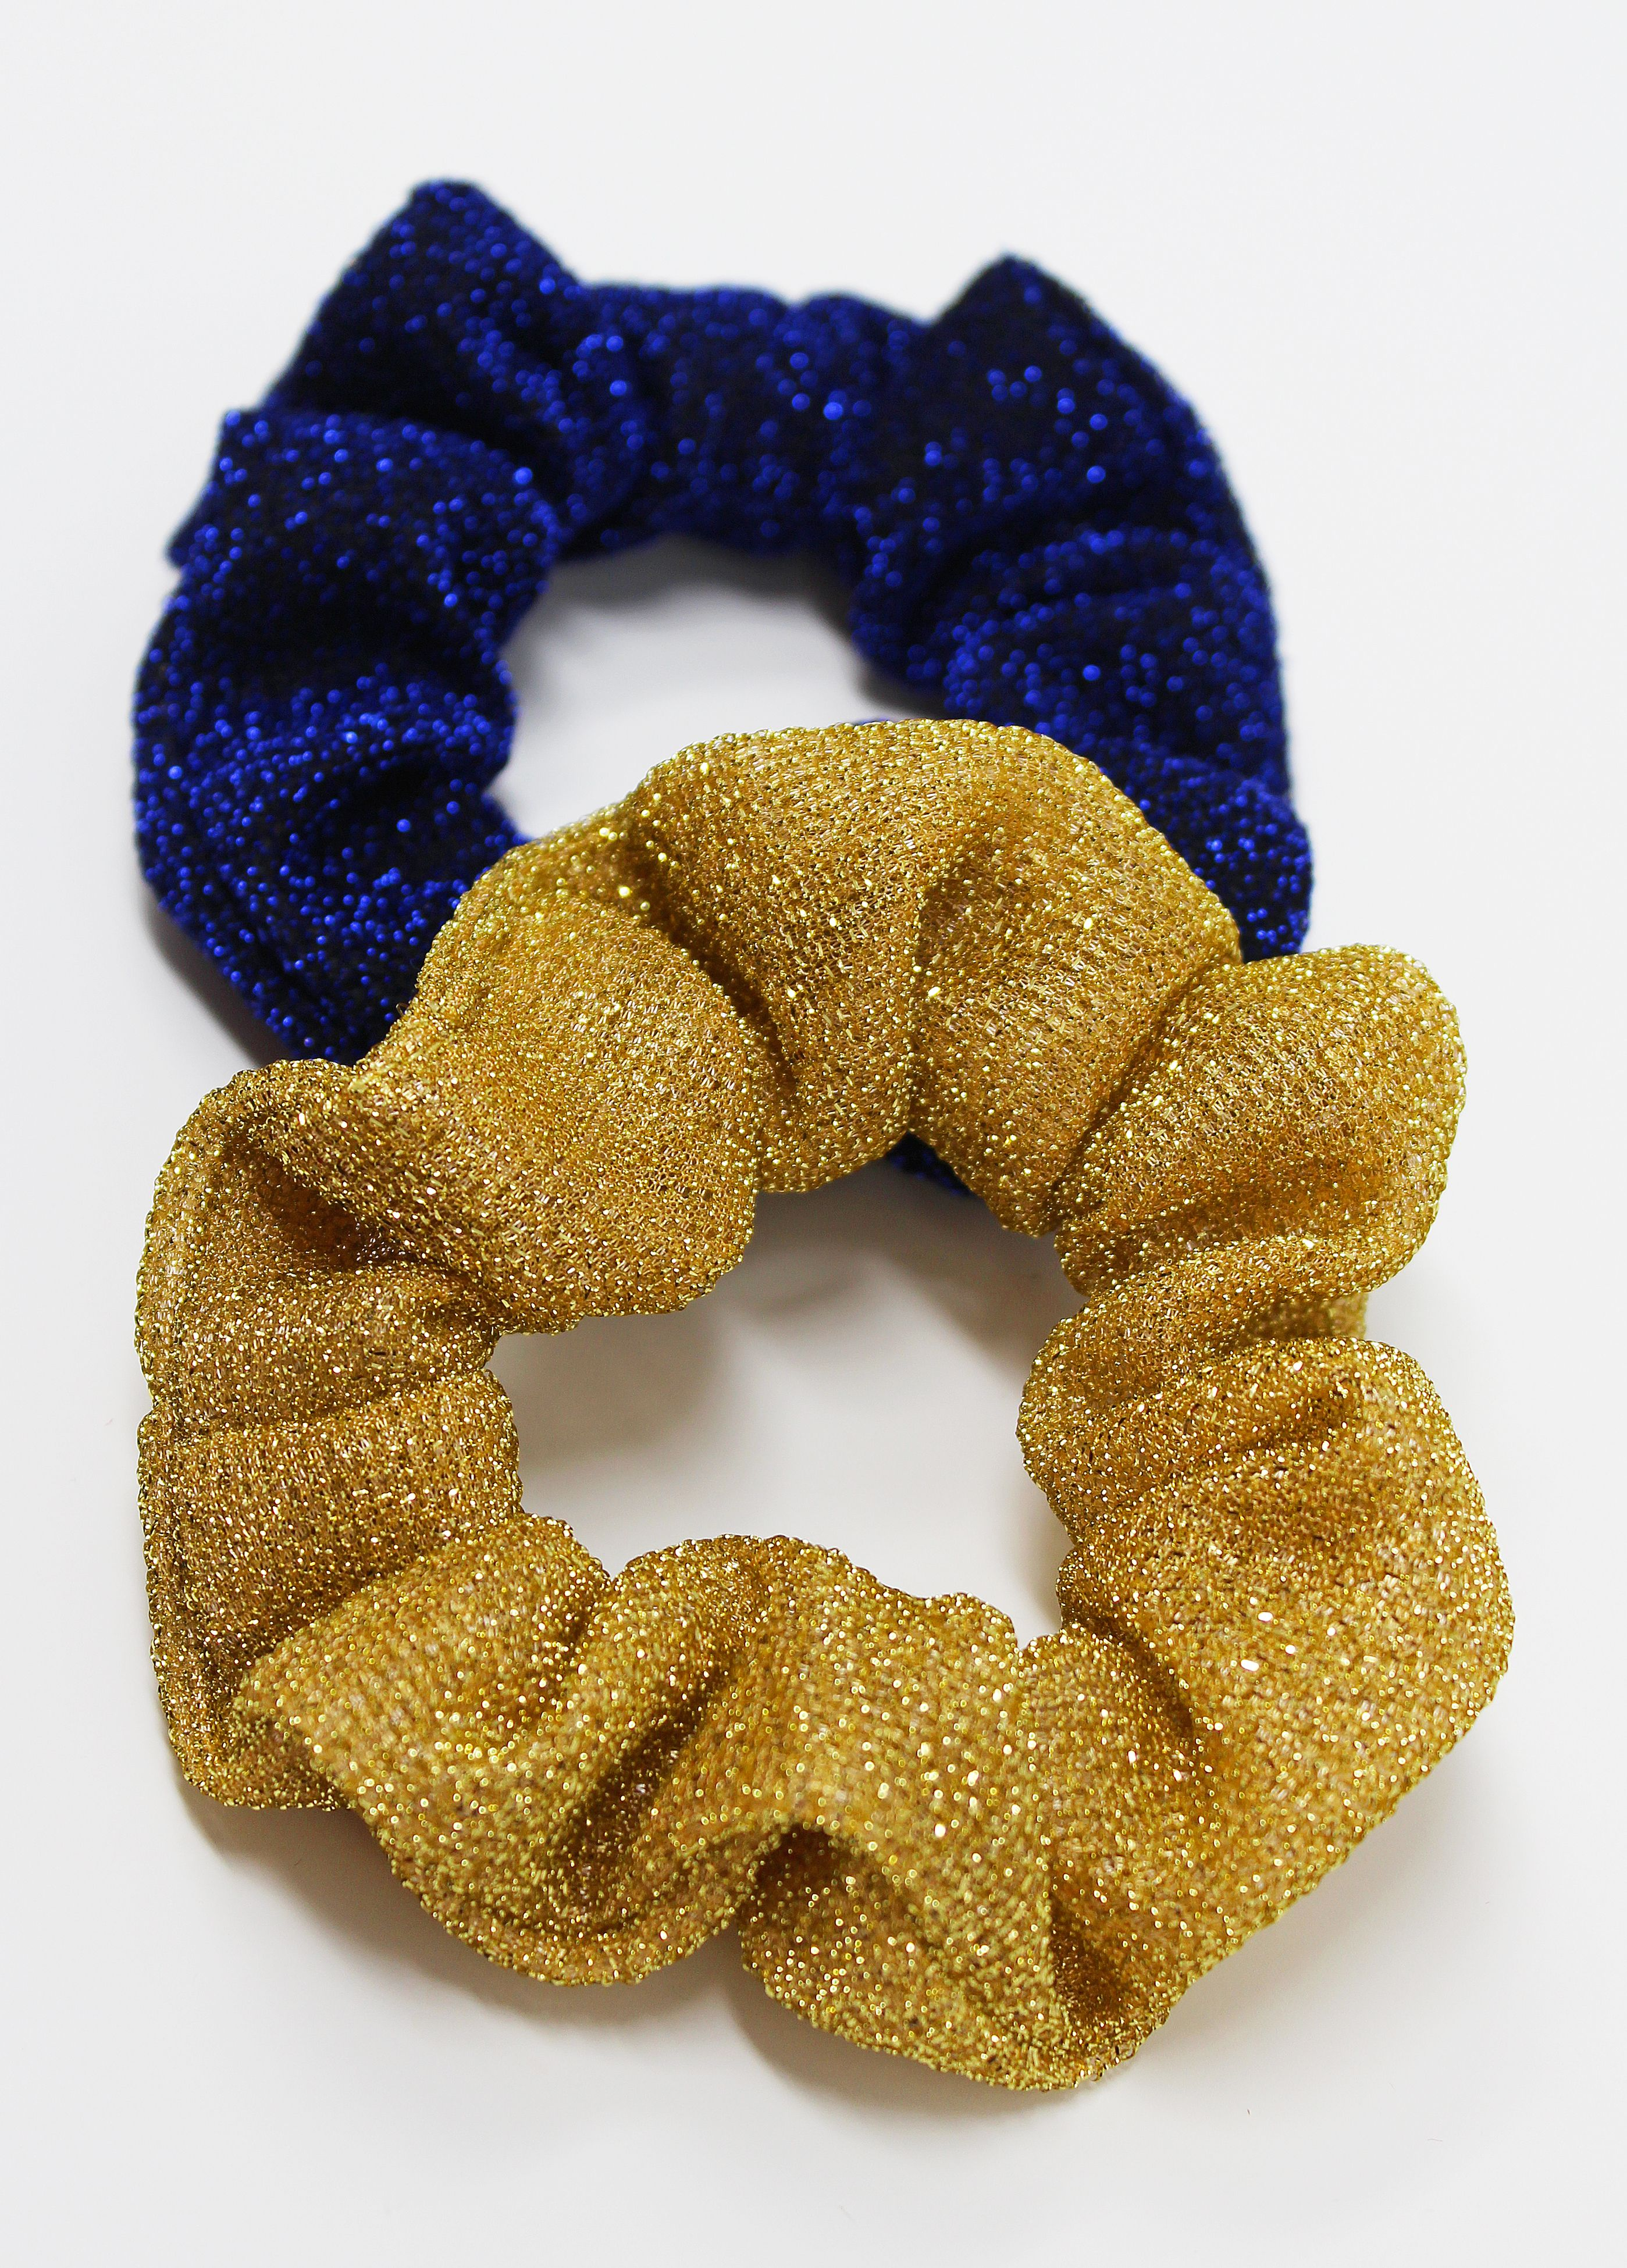 Gold & Blue Textured Hair Scrunchies #hairscrunchie